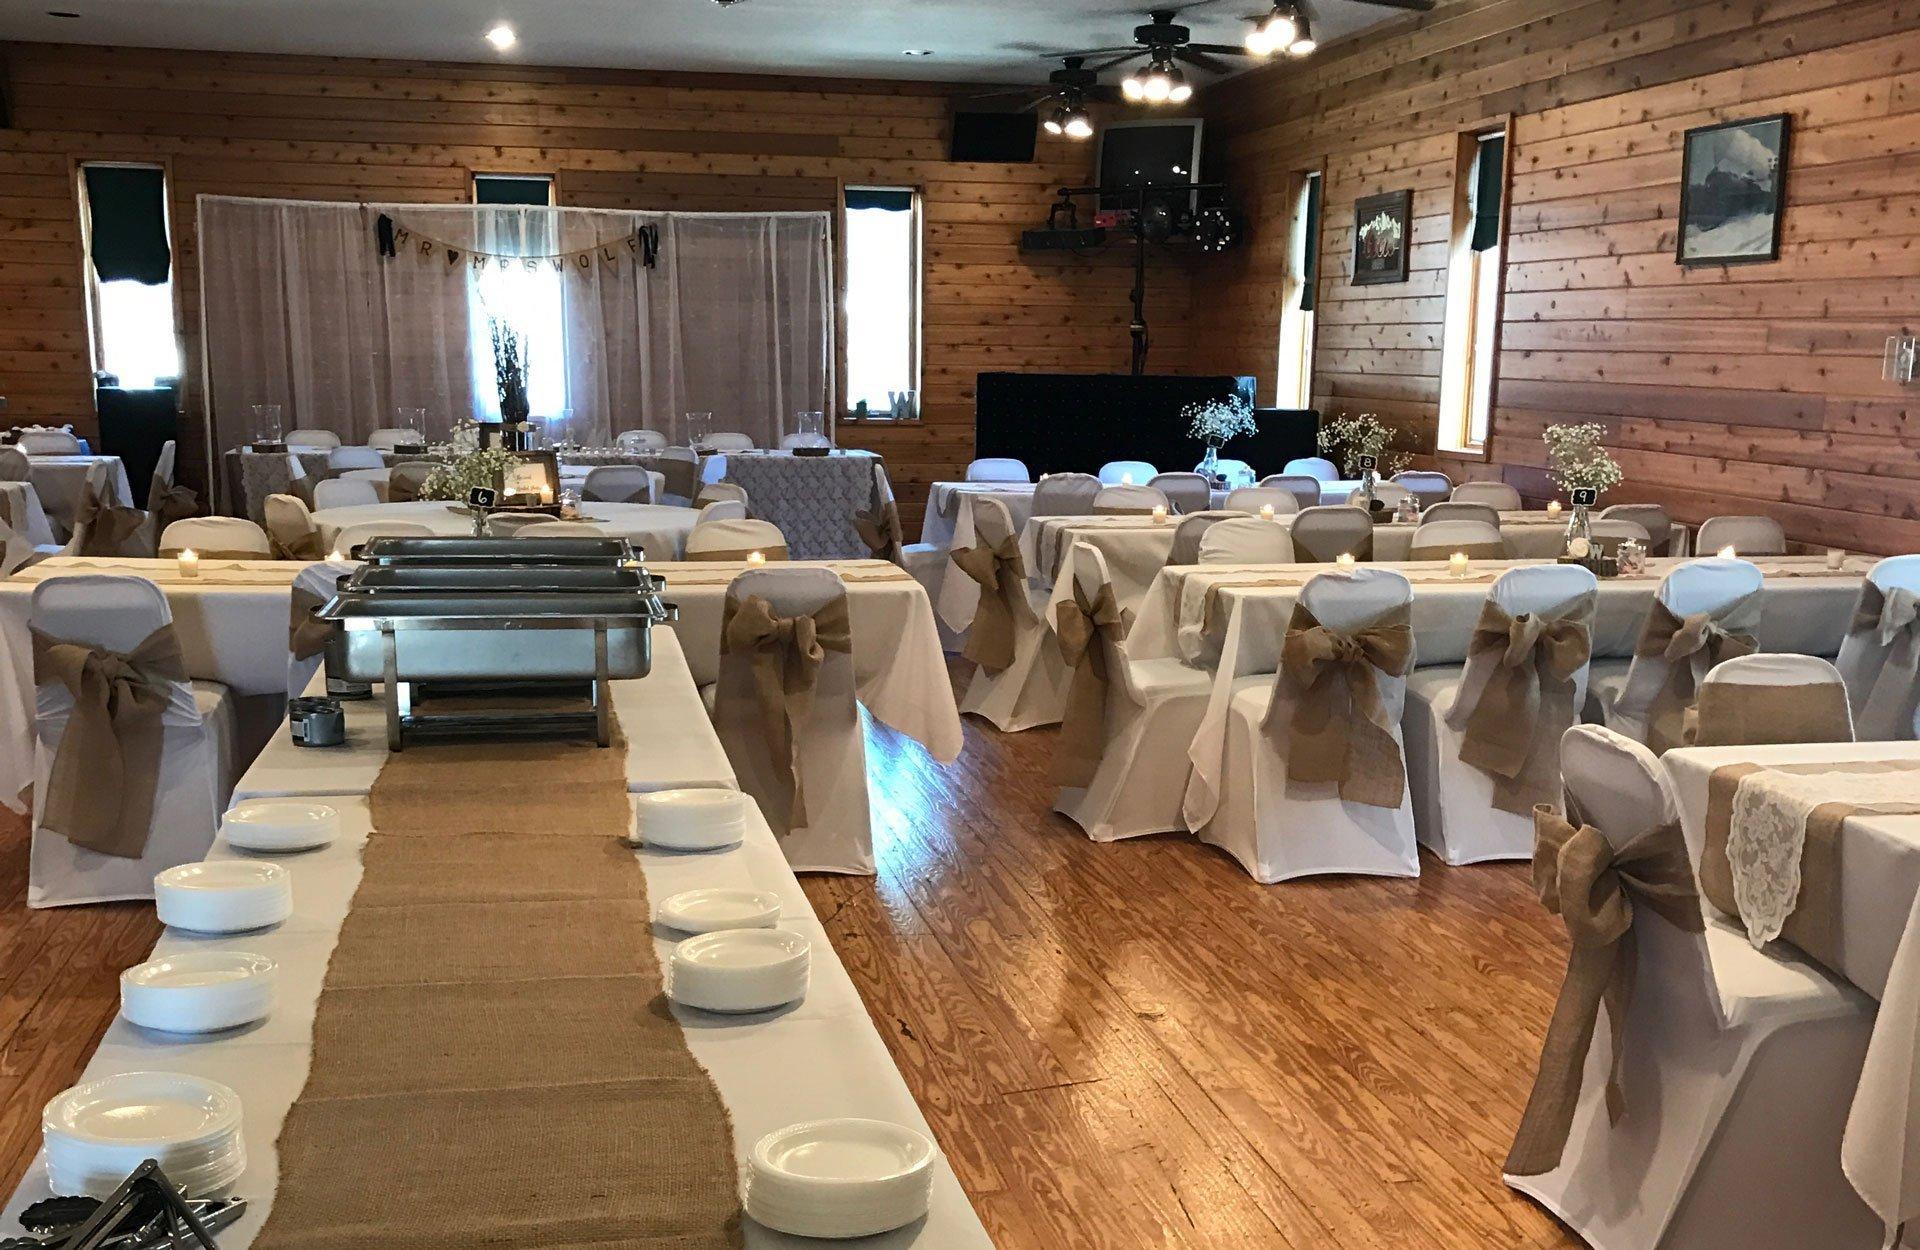 Railside Bar & Grill - Lee County Illinois Tourism